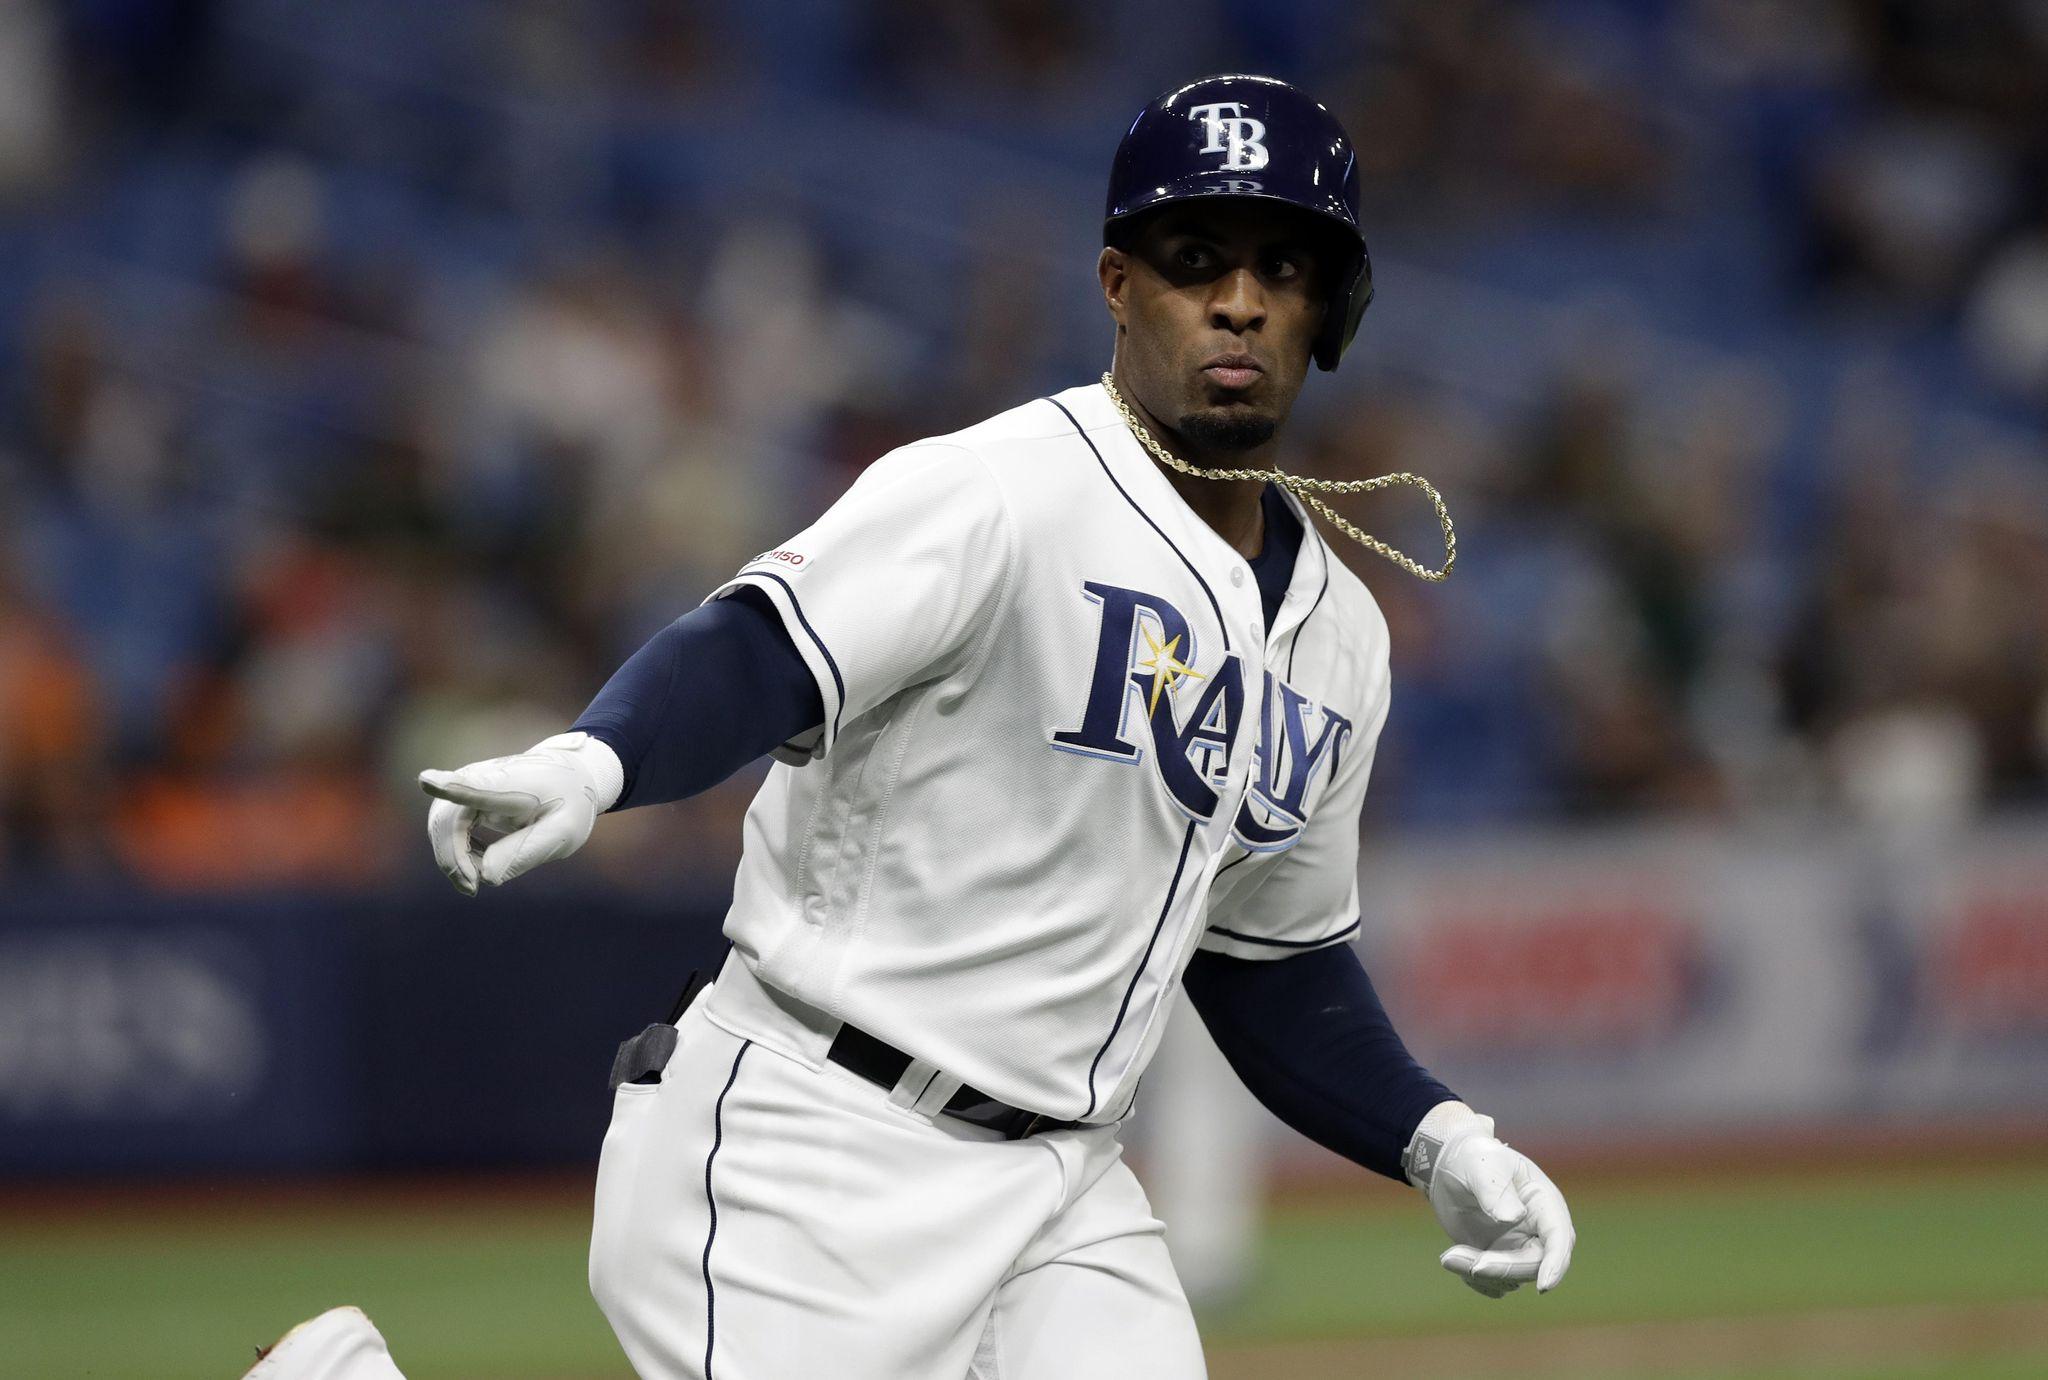 Orioles_rays_baseball_88972_s2048x1380